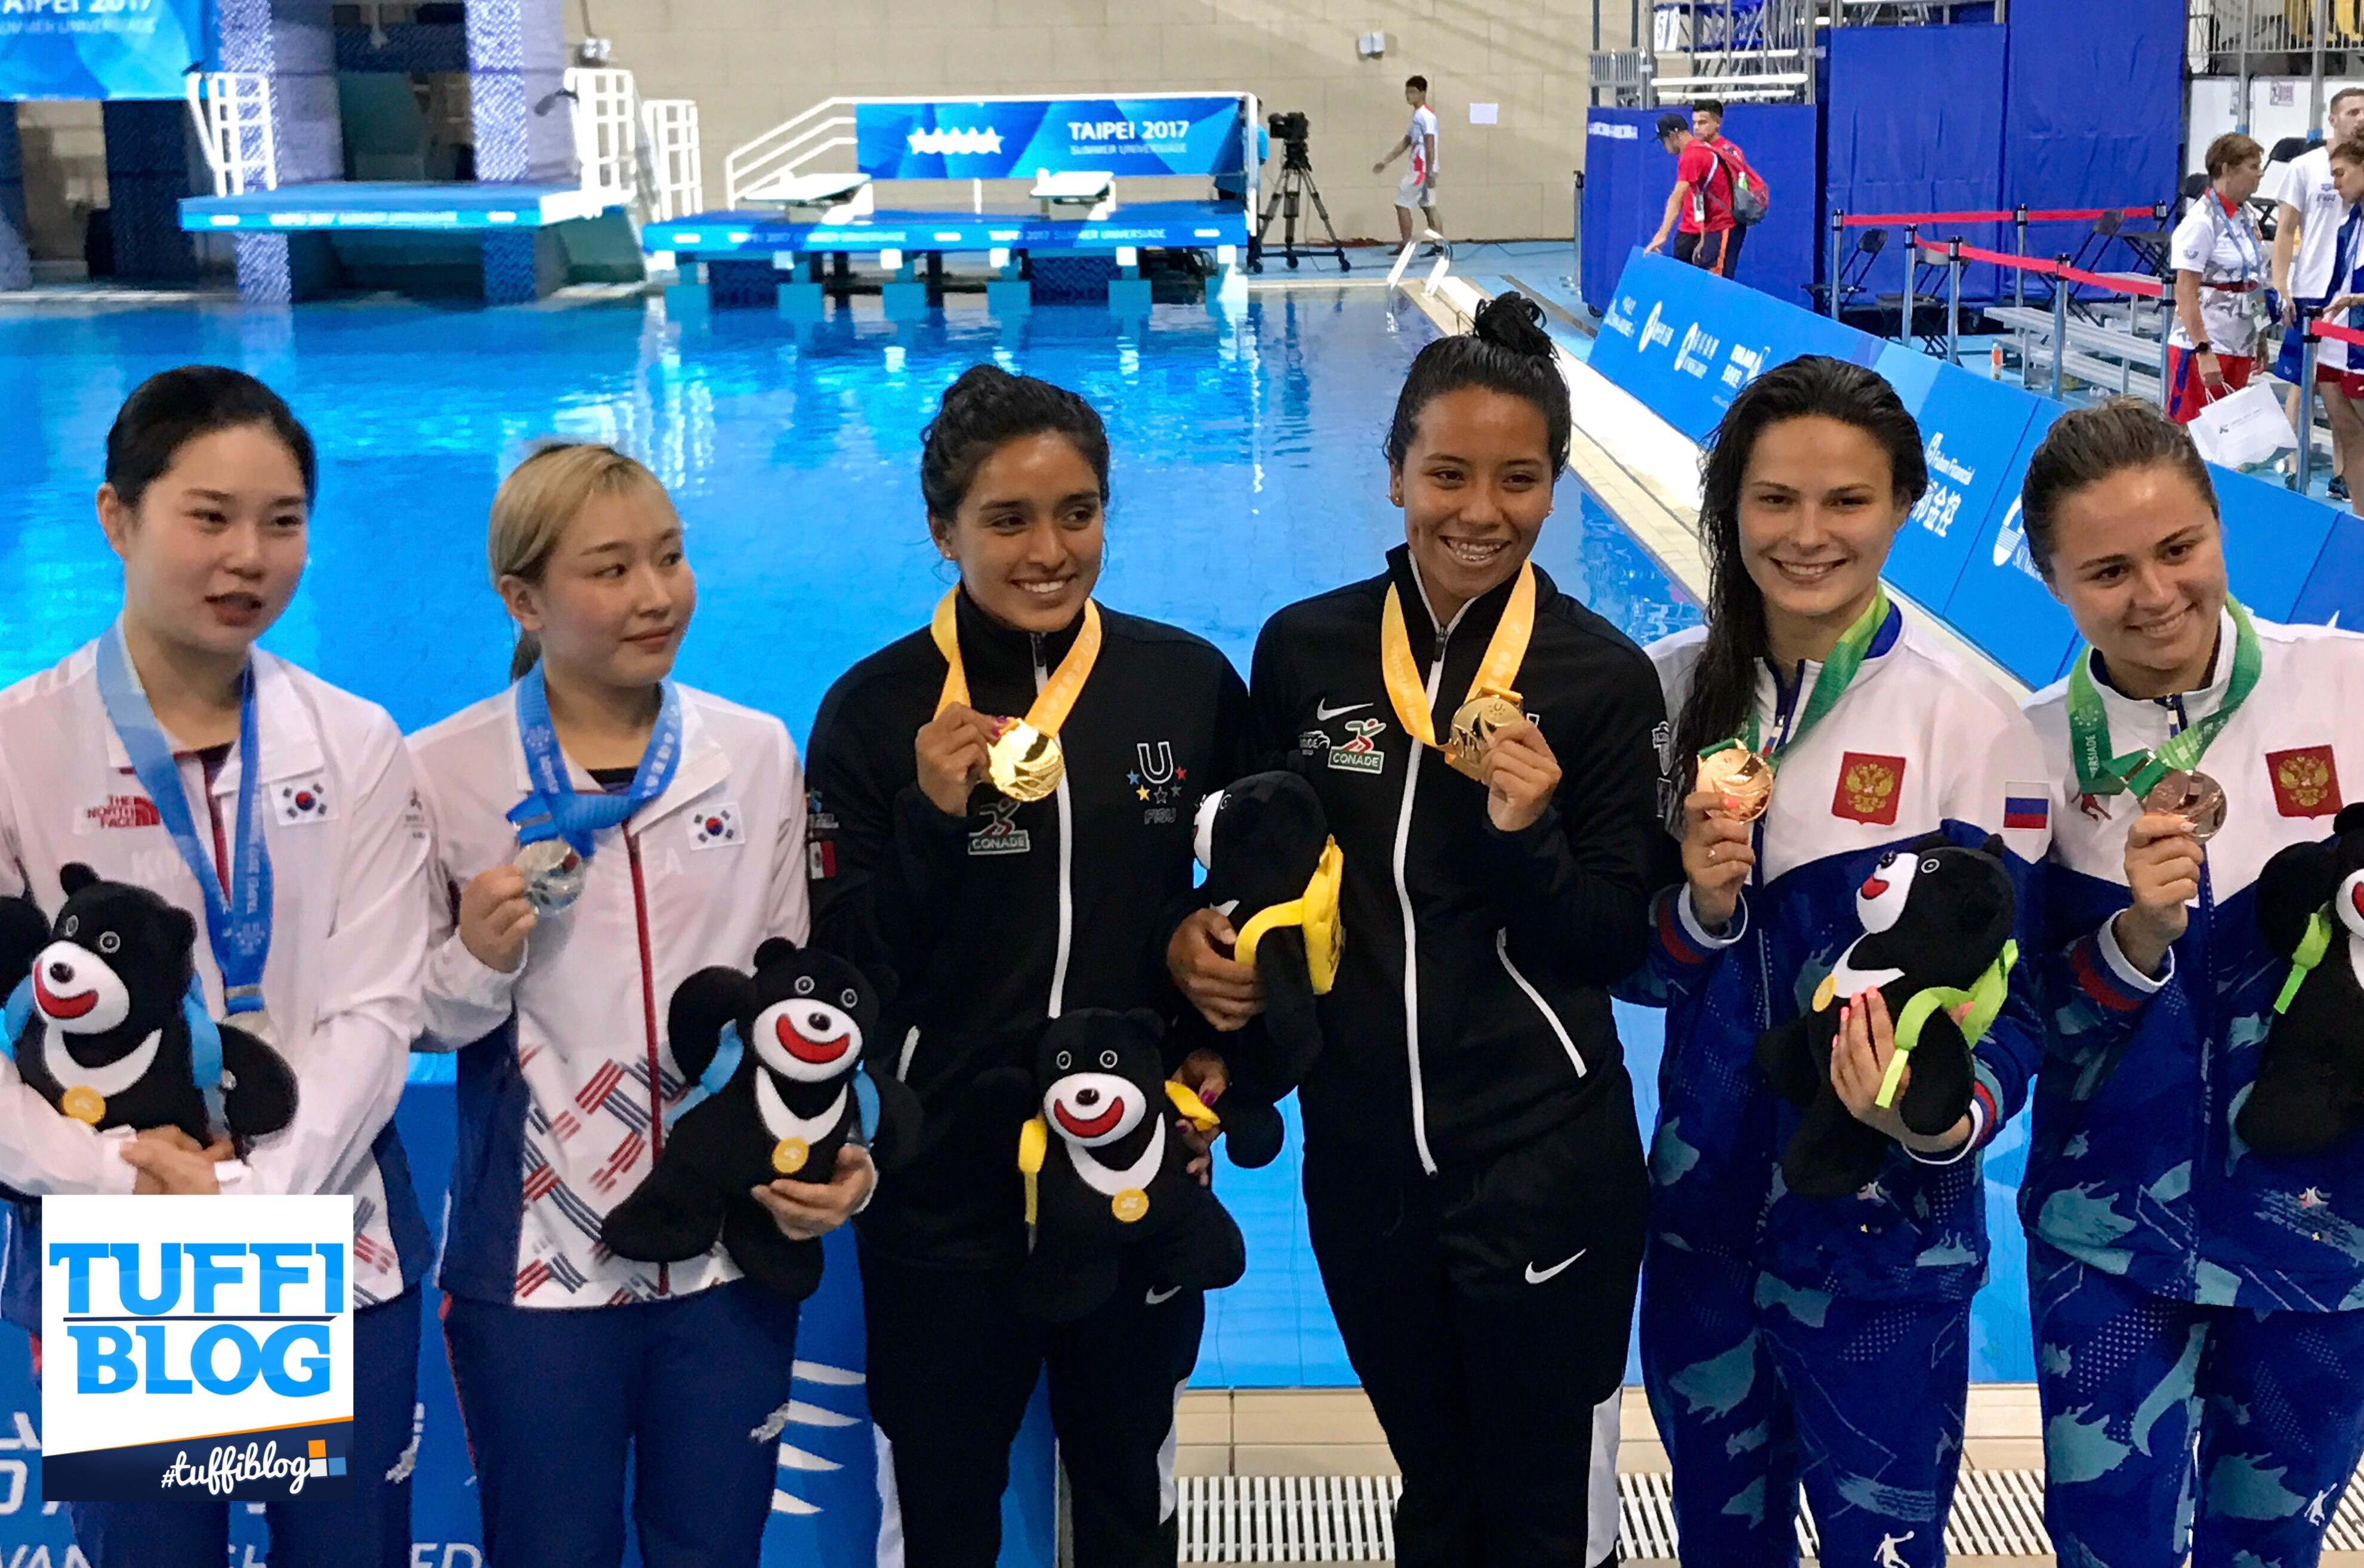 Universiadi 2017: Taipei - Alle messicane la vittoria nel sincro 3 metri.